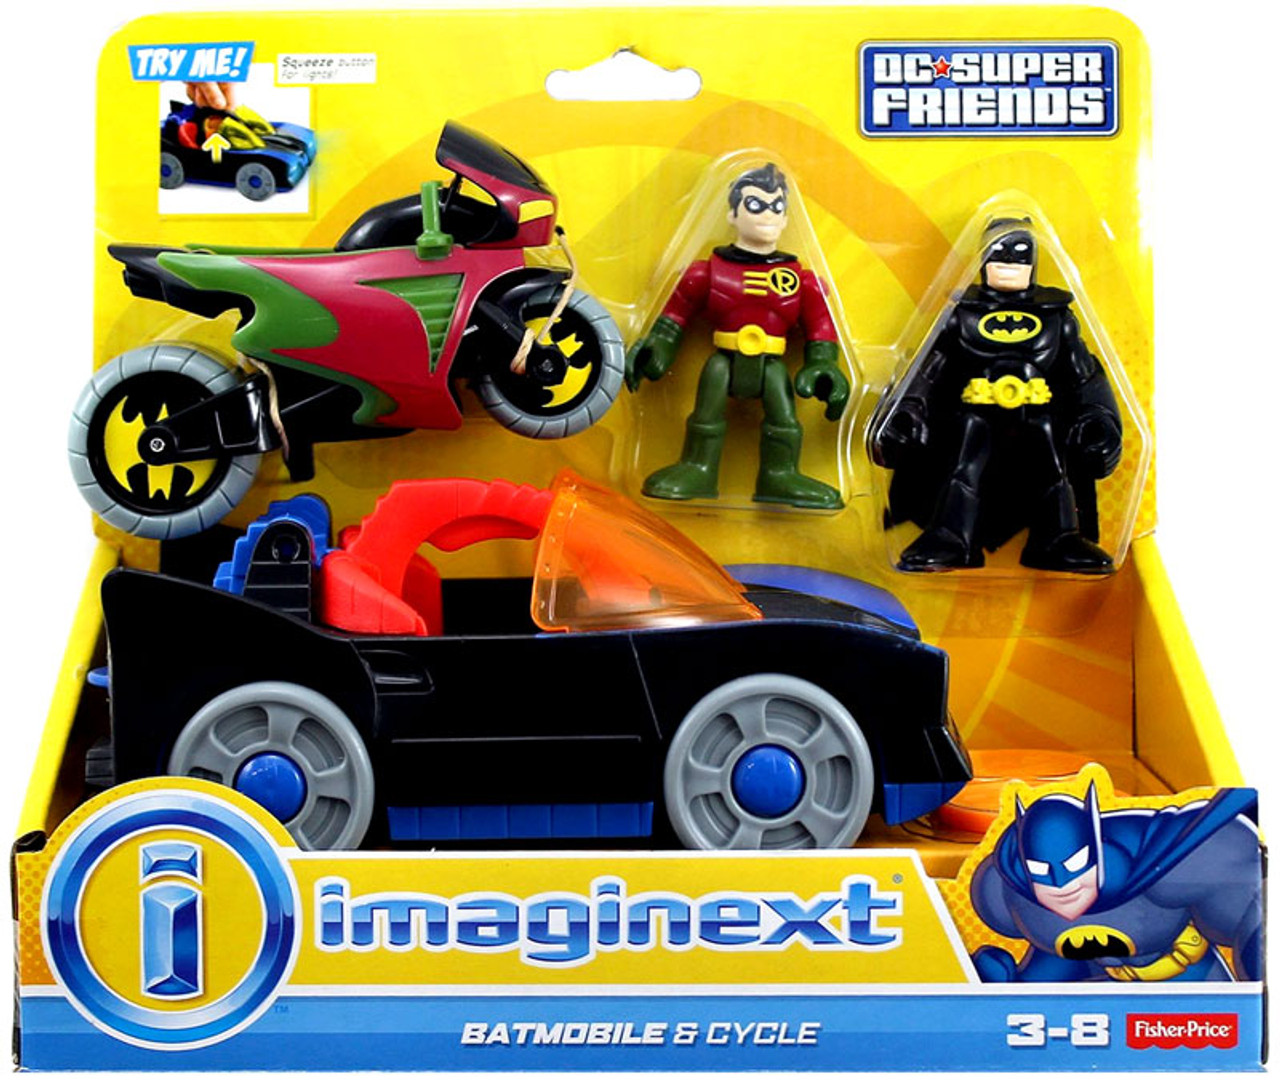 Fisher Price Dc Super Friends Batman Imaginext Batmobile